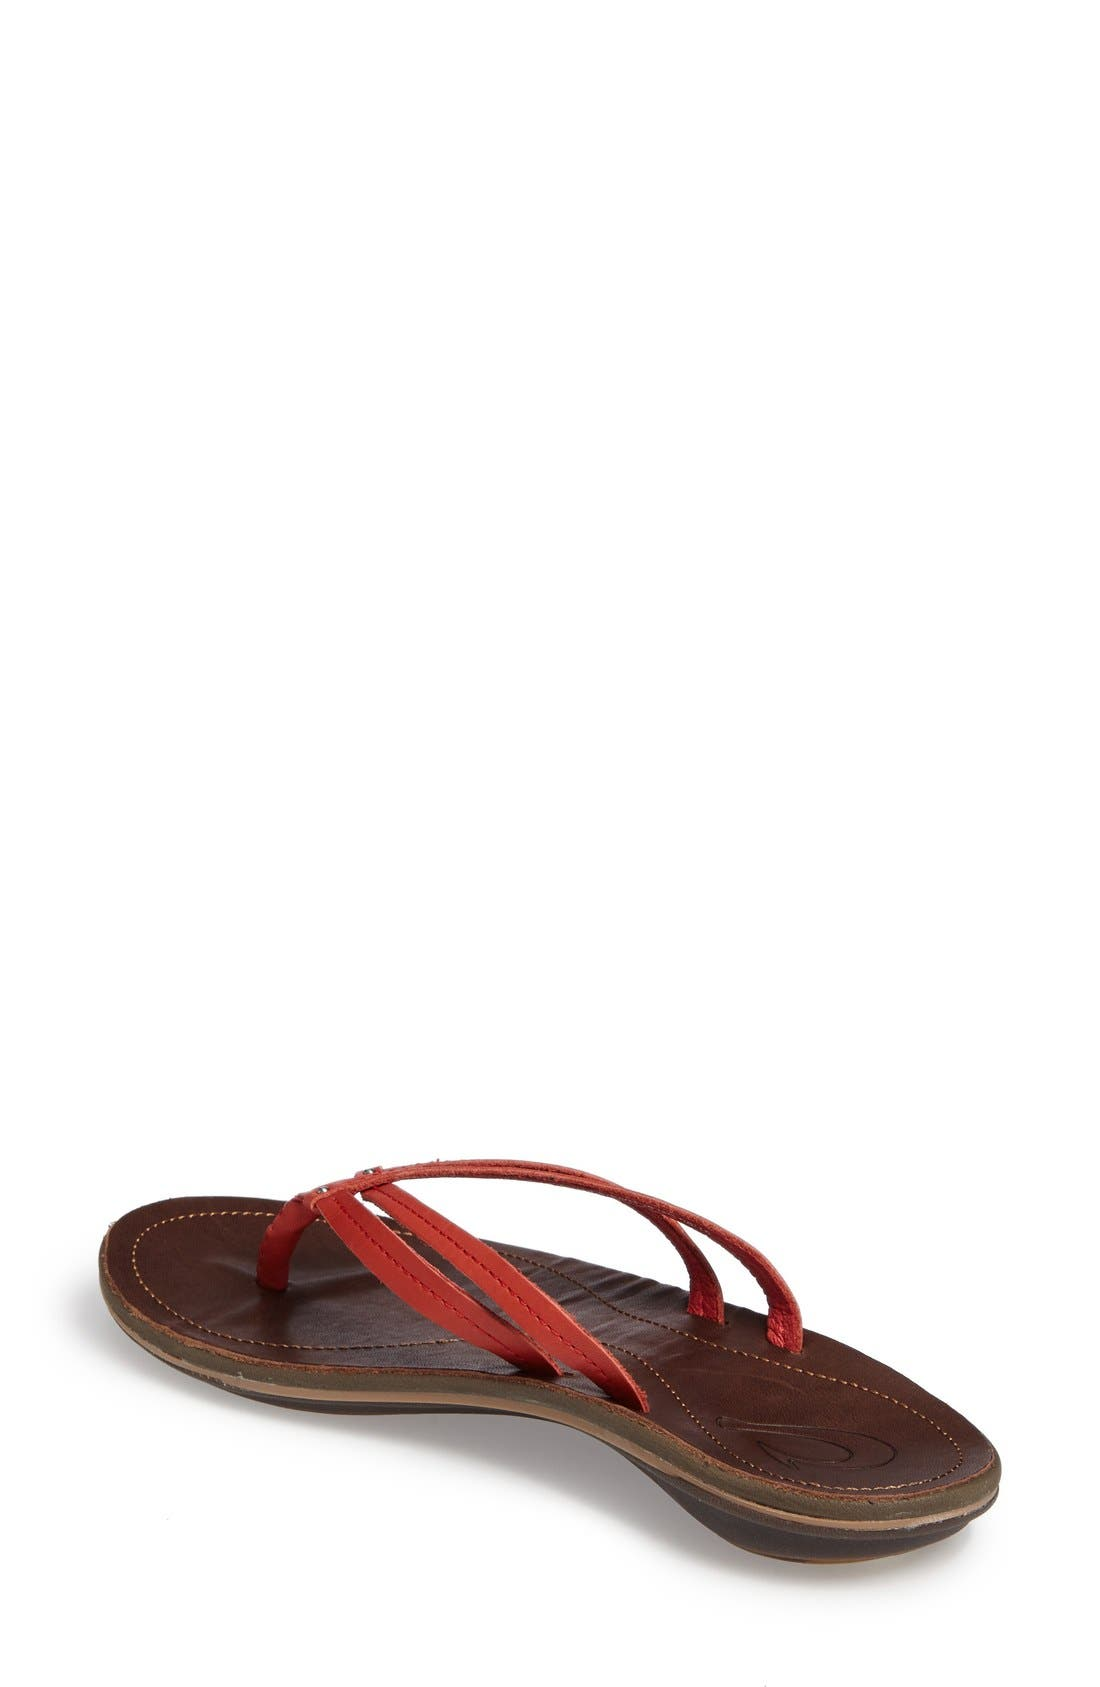 Alternate Image 2  - OluKai 'U'i' Thong Sandal (Women)